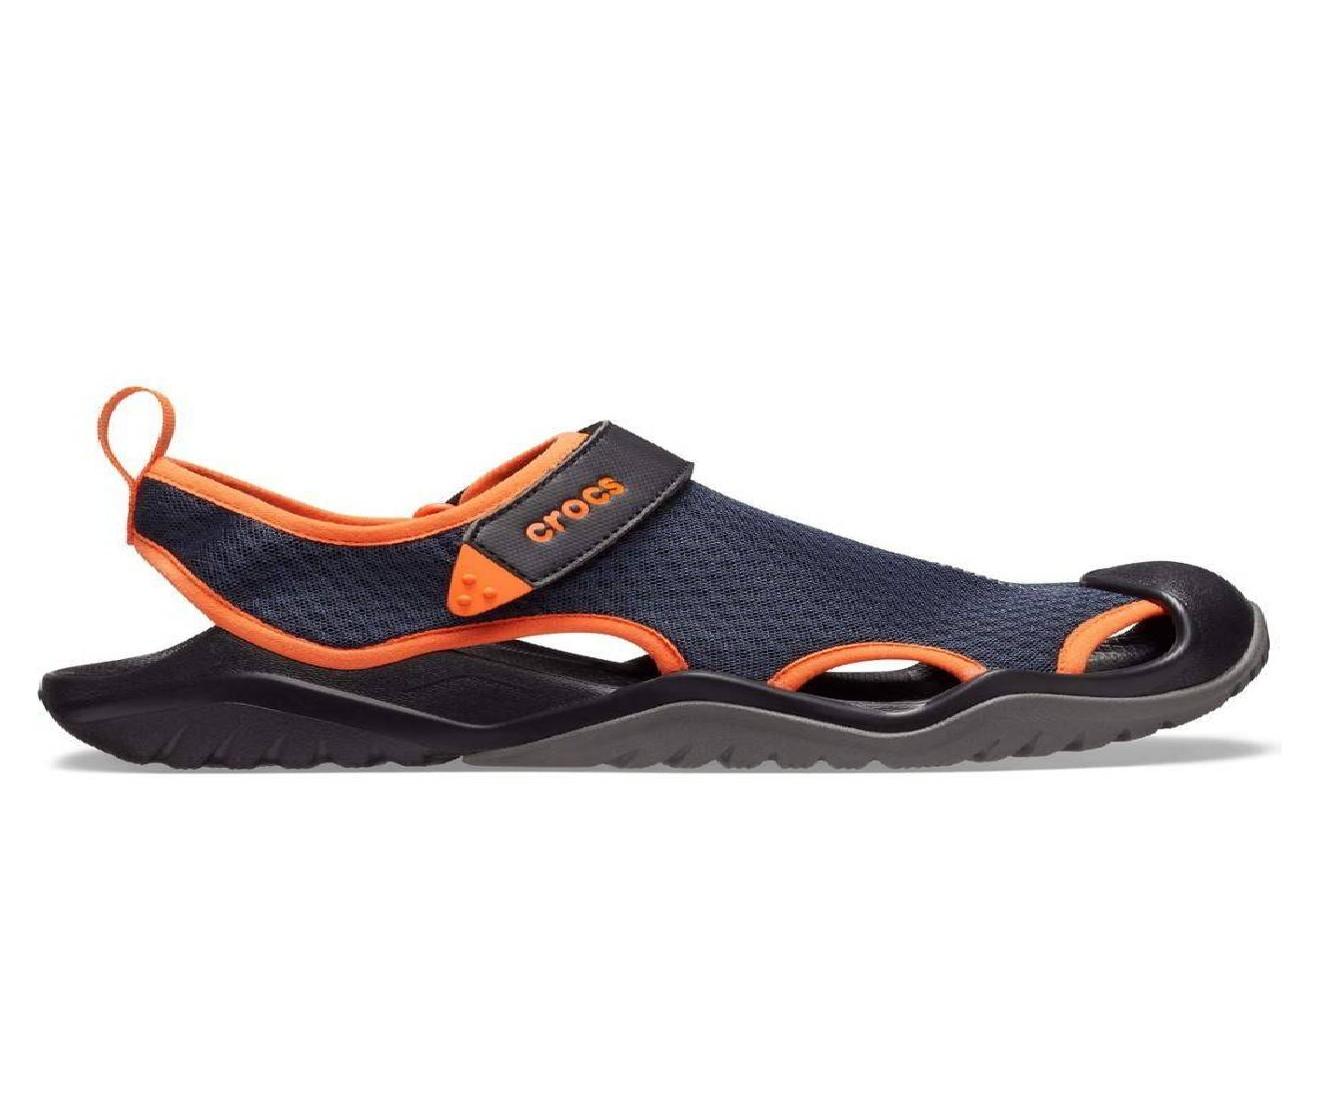 Swiftwater Mesh Deck Sandal Navy/Tangerine